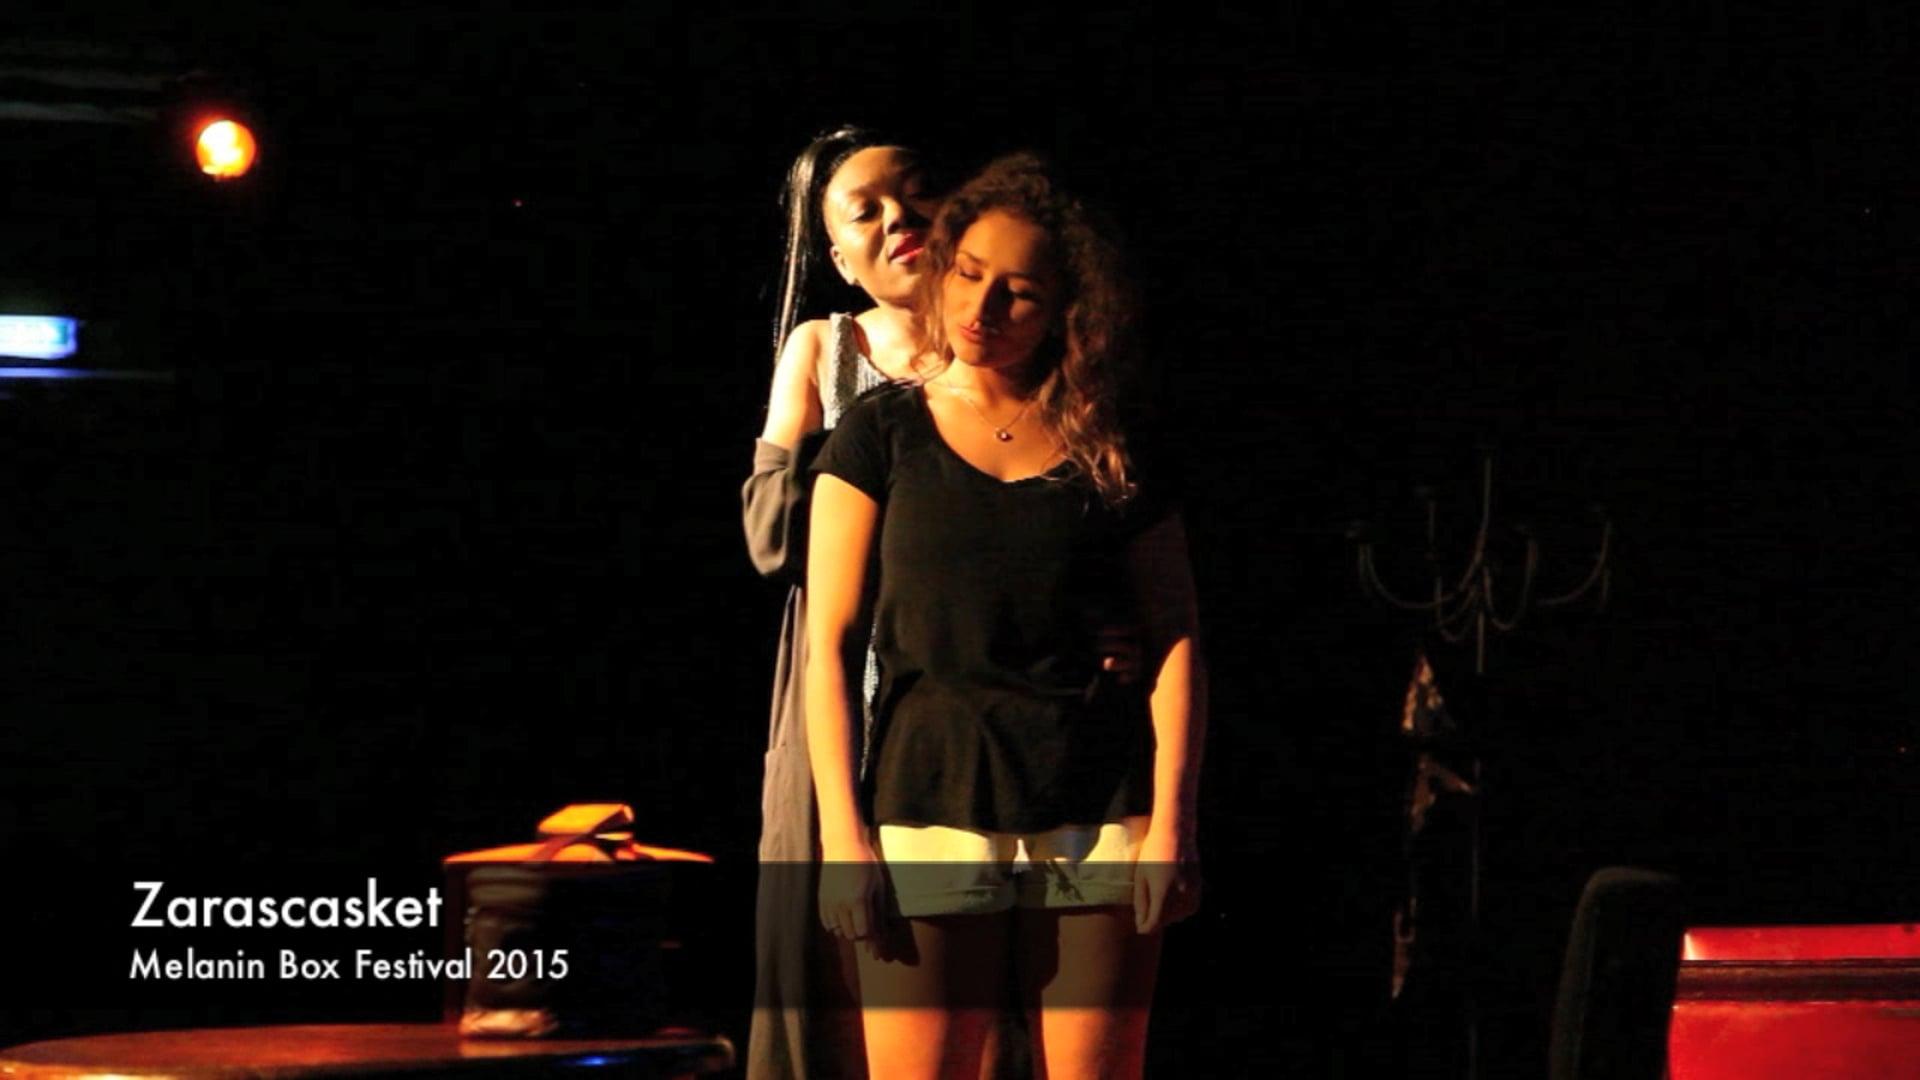 Zarascasket at Melanin Box Festival 2015